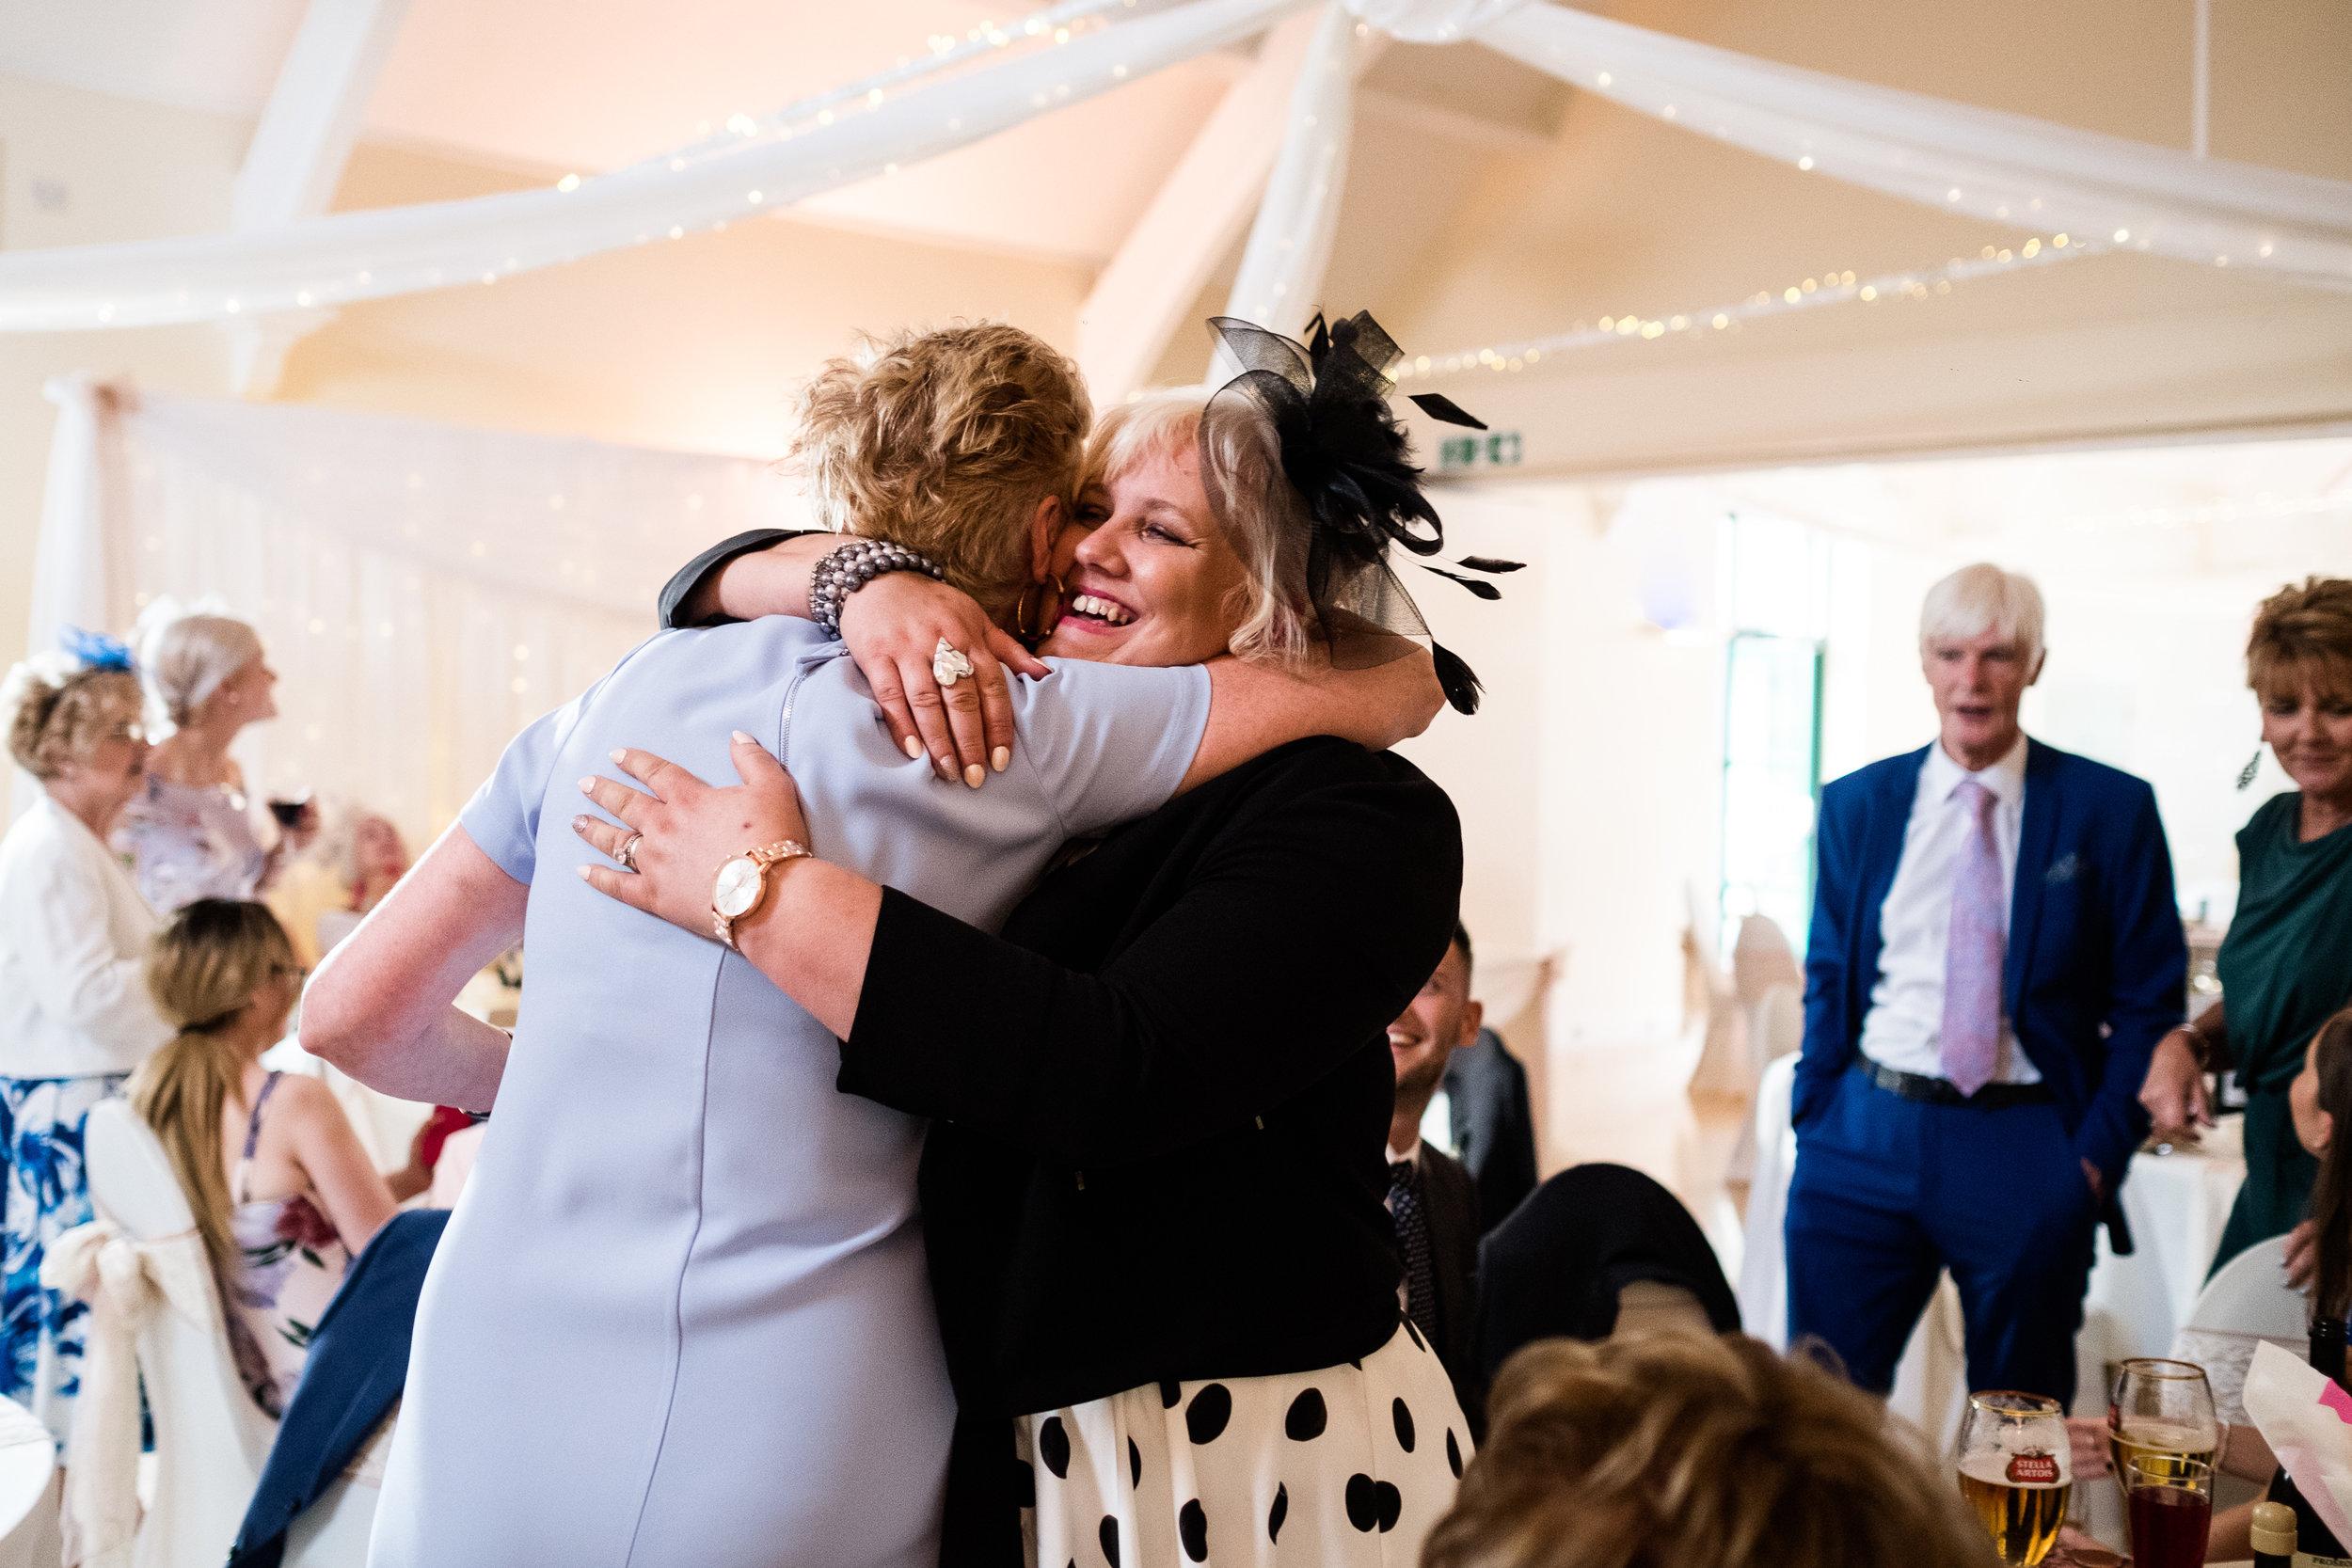 Summer Documentary Wedding Photography Floral Hall, Stoke-on-Trent, Staffordshire - Jenny Harper-52.jpg